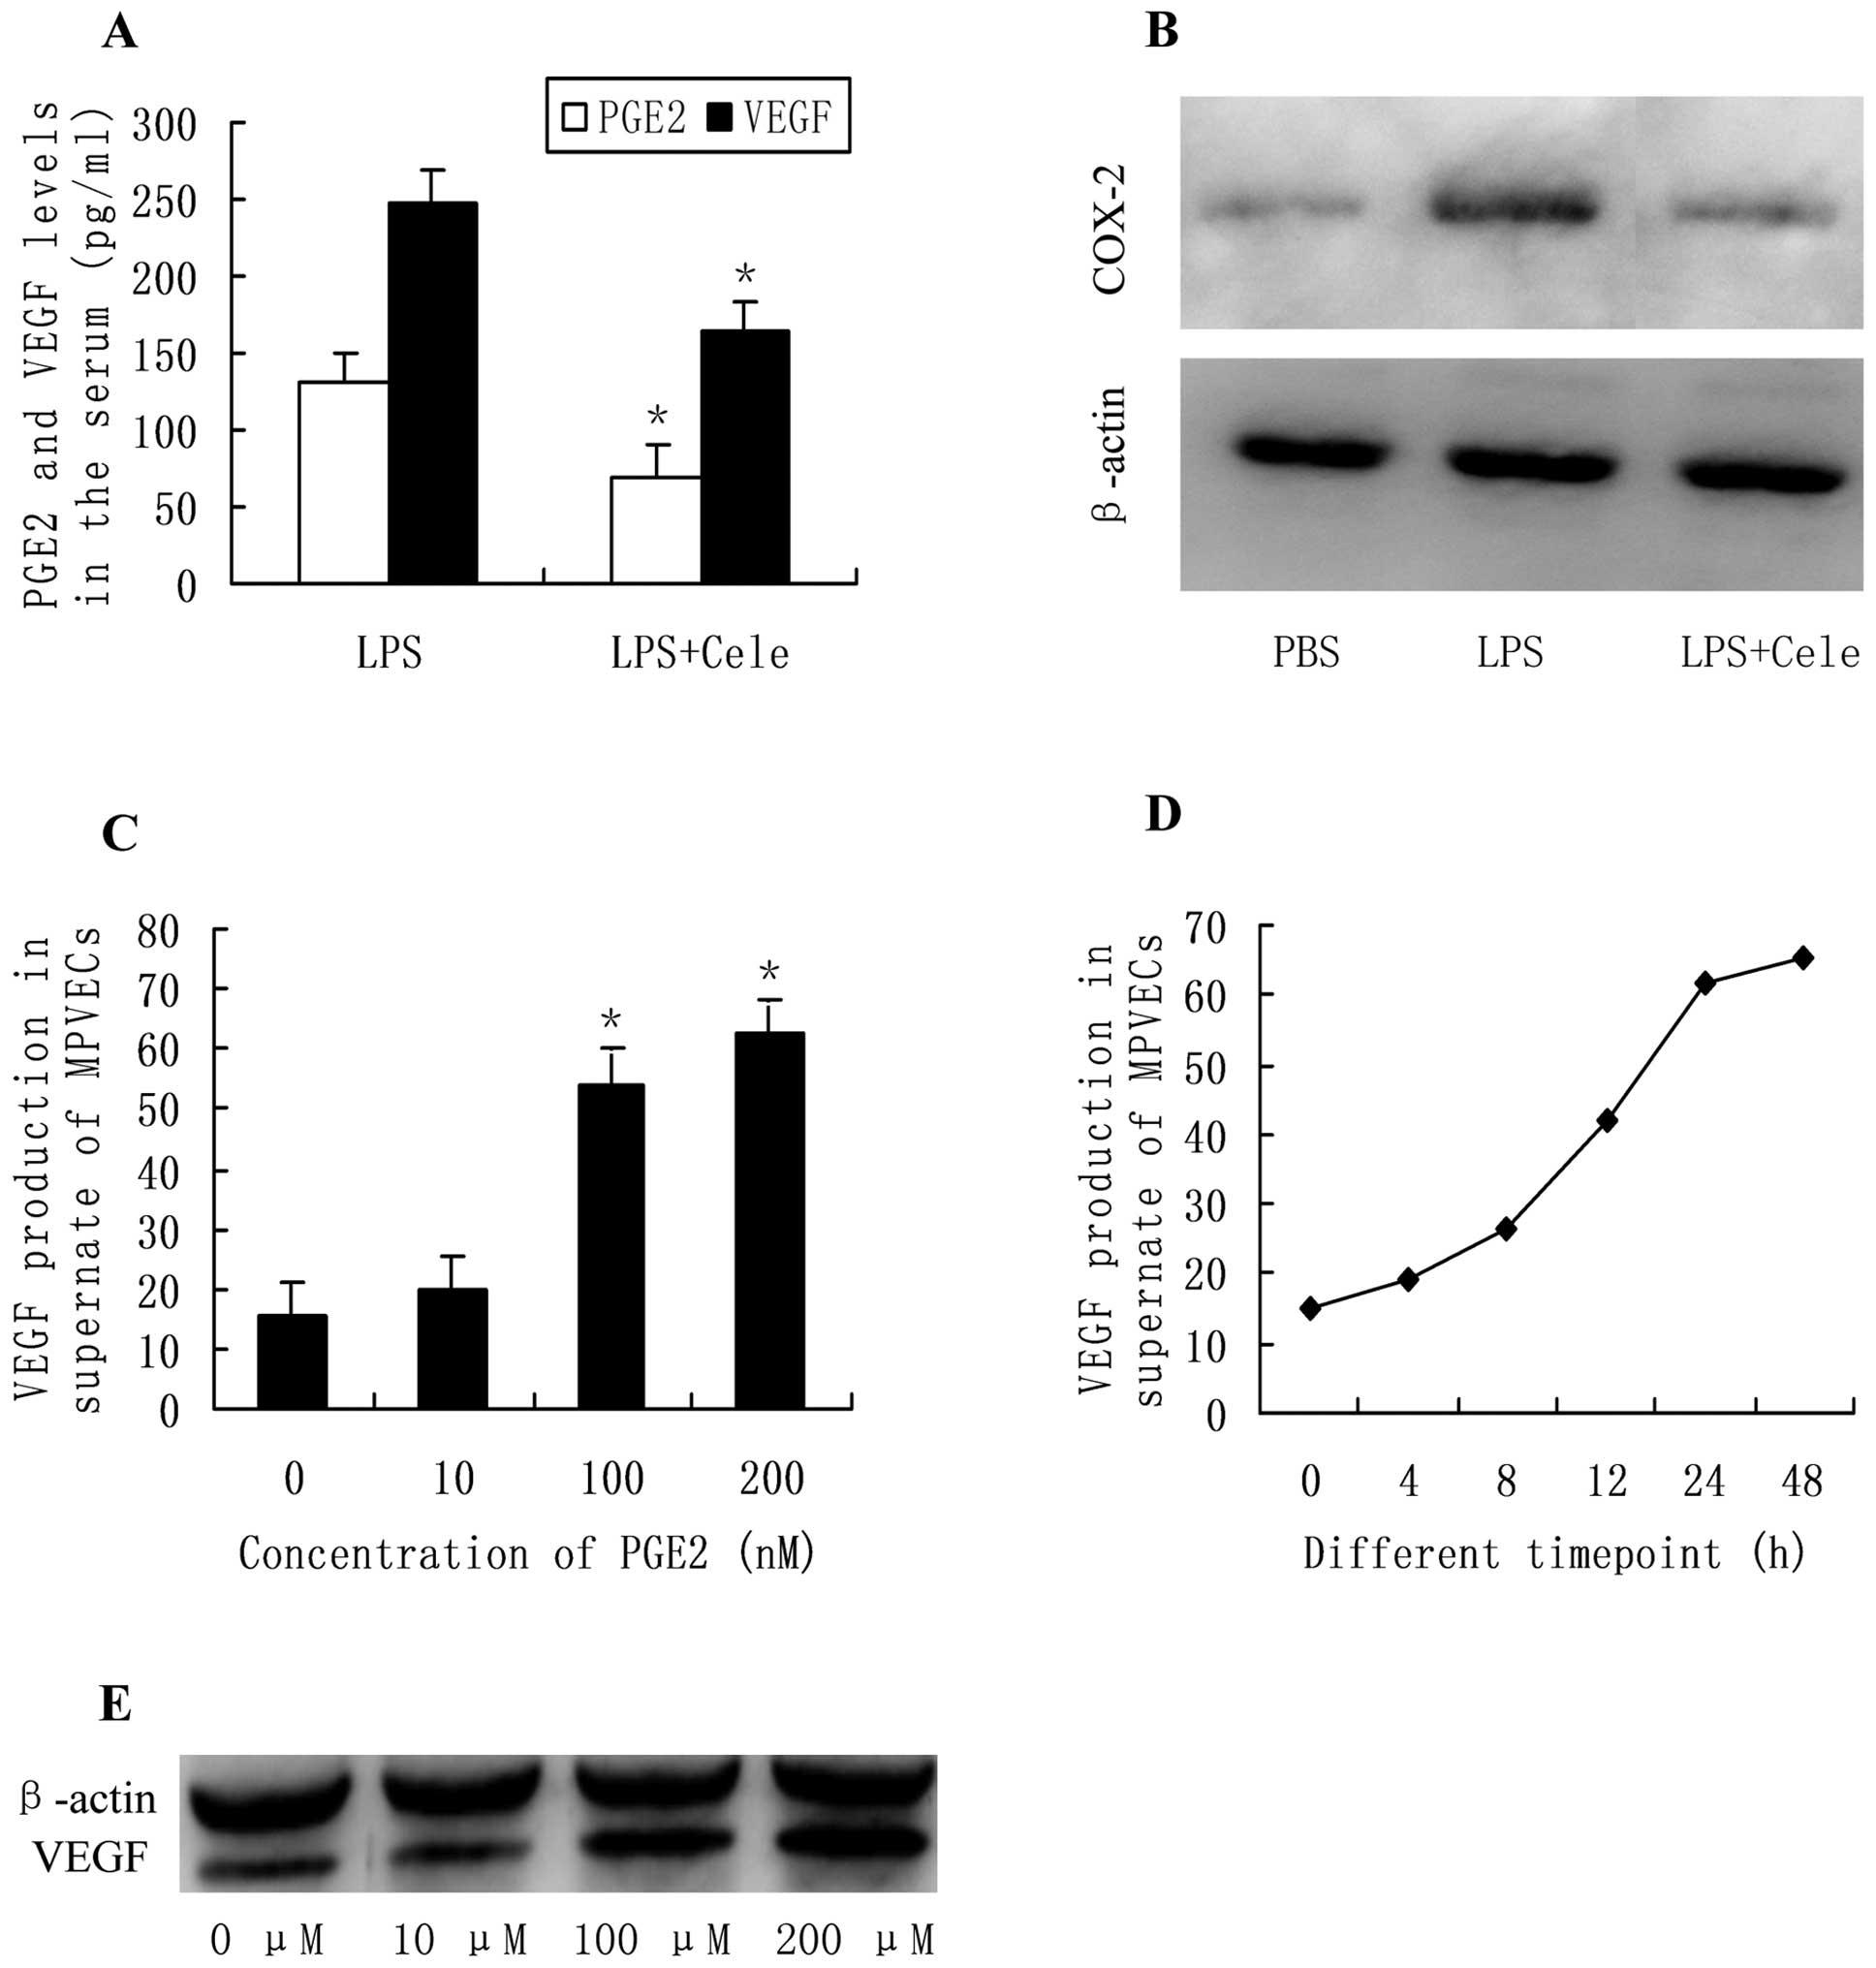 Pathways of Prostaglandin-Mediated Recovery of Ischemia-Injured Intestine.